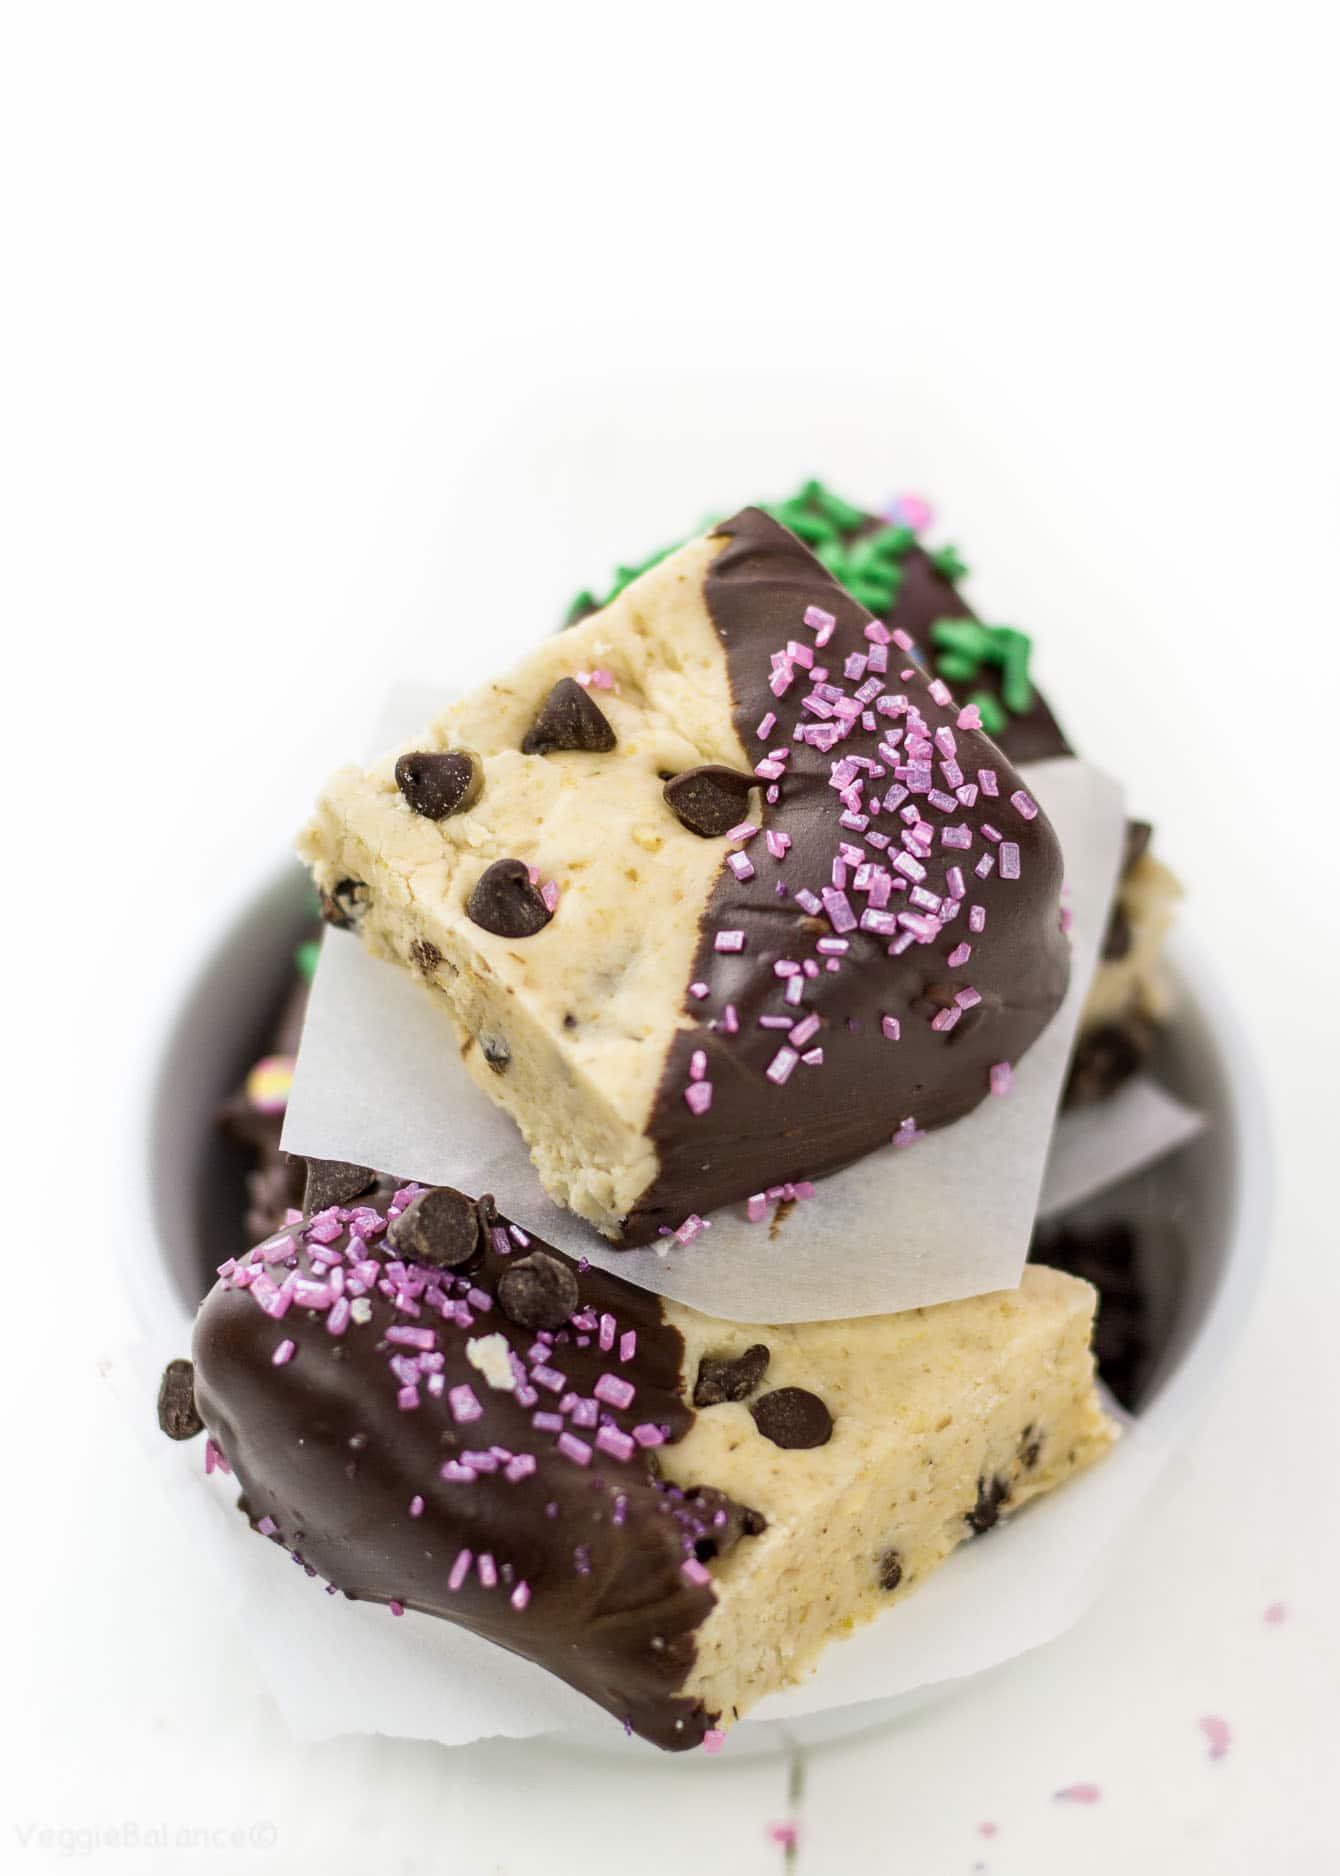 Edible Cookie Dough Bites Gluten-Free, Dairy-Free, Vegan - Veggiebalance.com